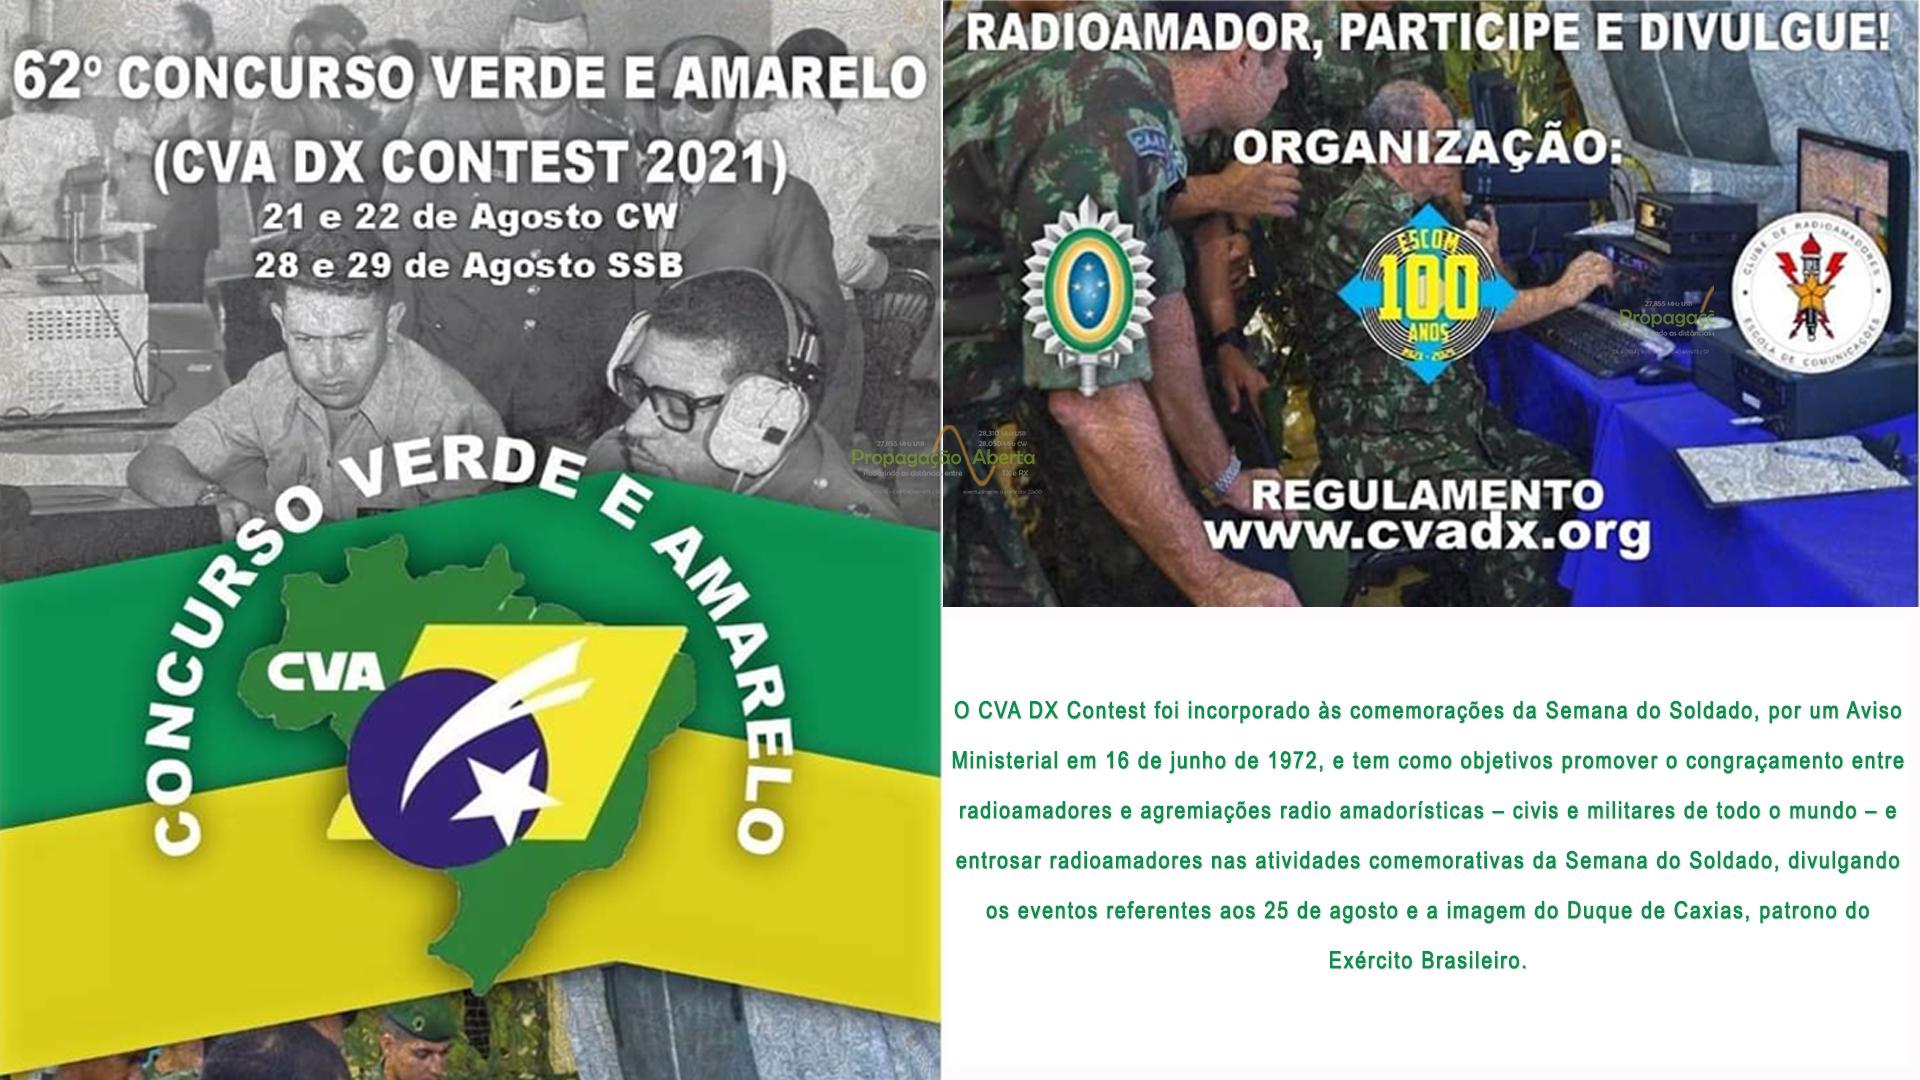 CVA-DX-2021-site-sobre-radioamador-radioamadorismo-px-11-metros-Propagacao-aberta